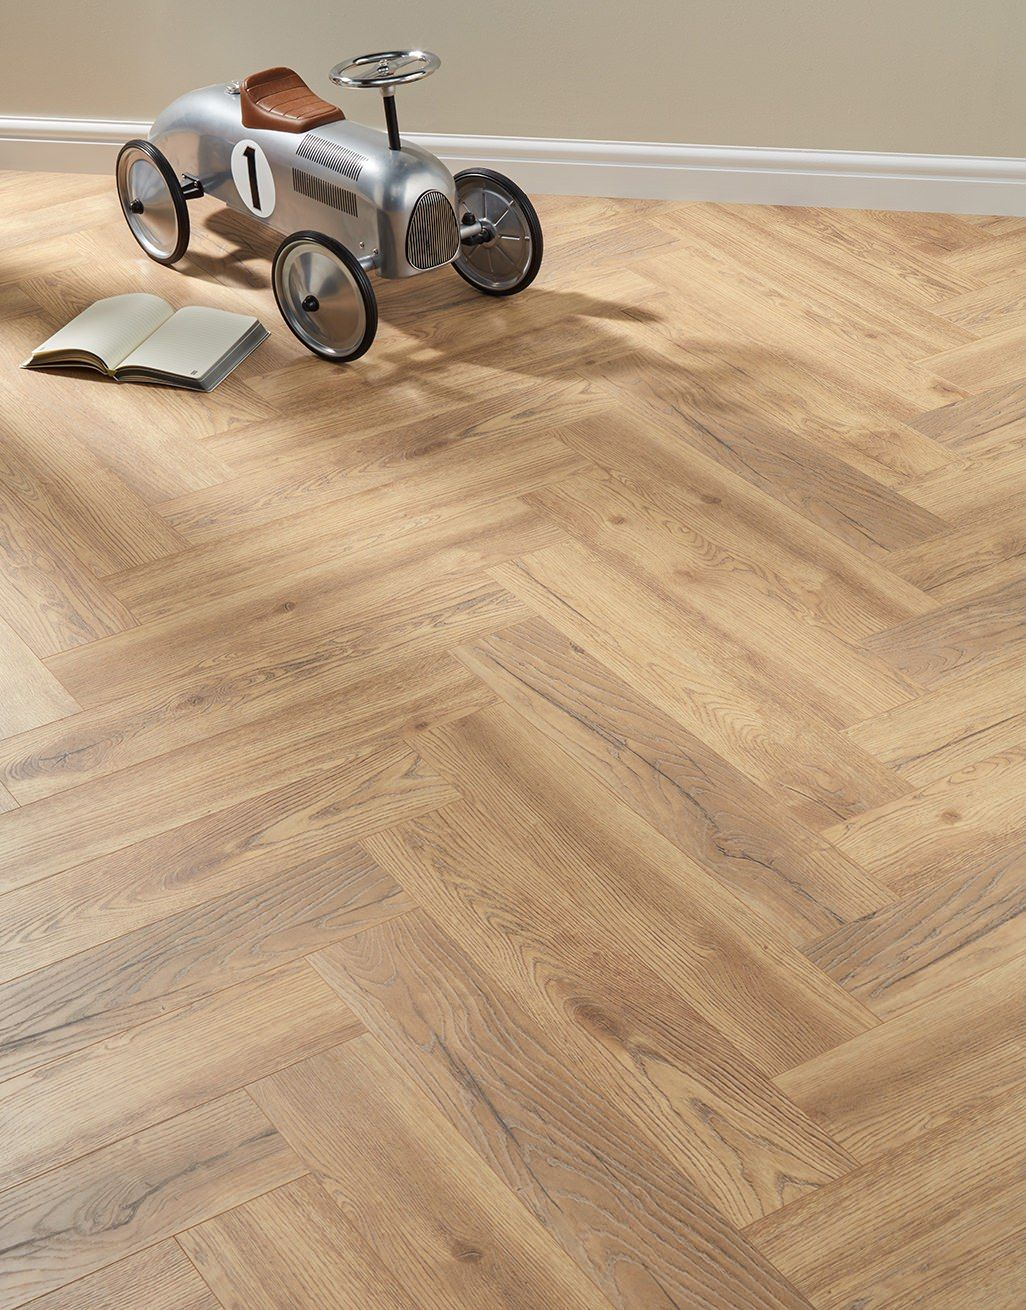 Regency Oak Laminate Flooring, Real Wood Effect Laminate Flooring